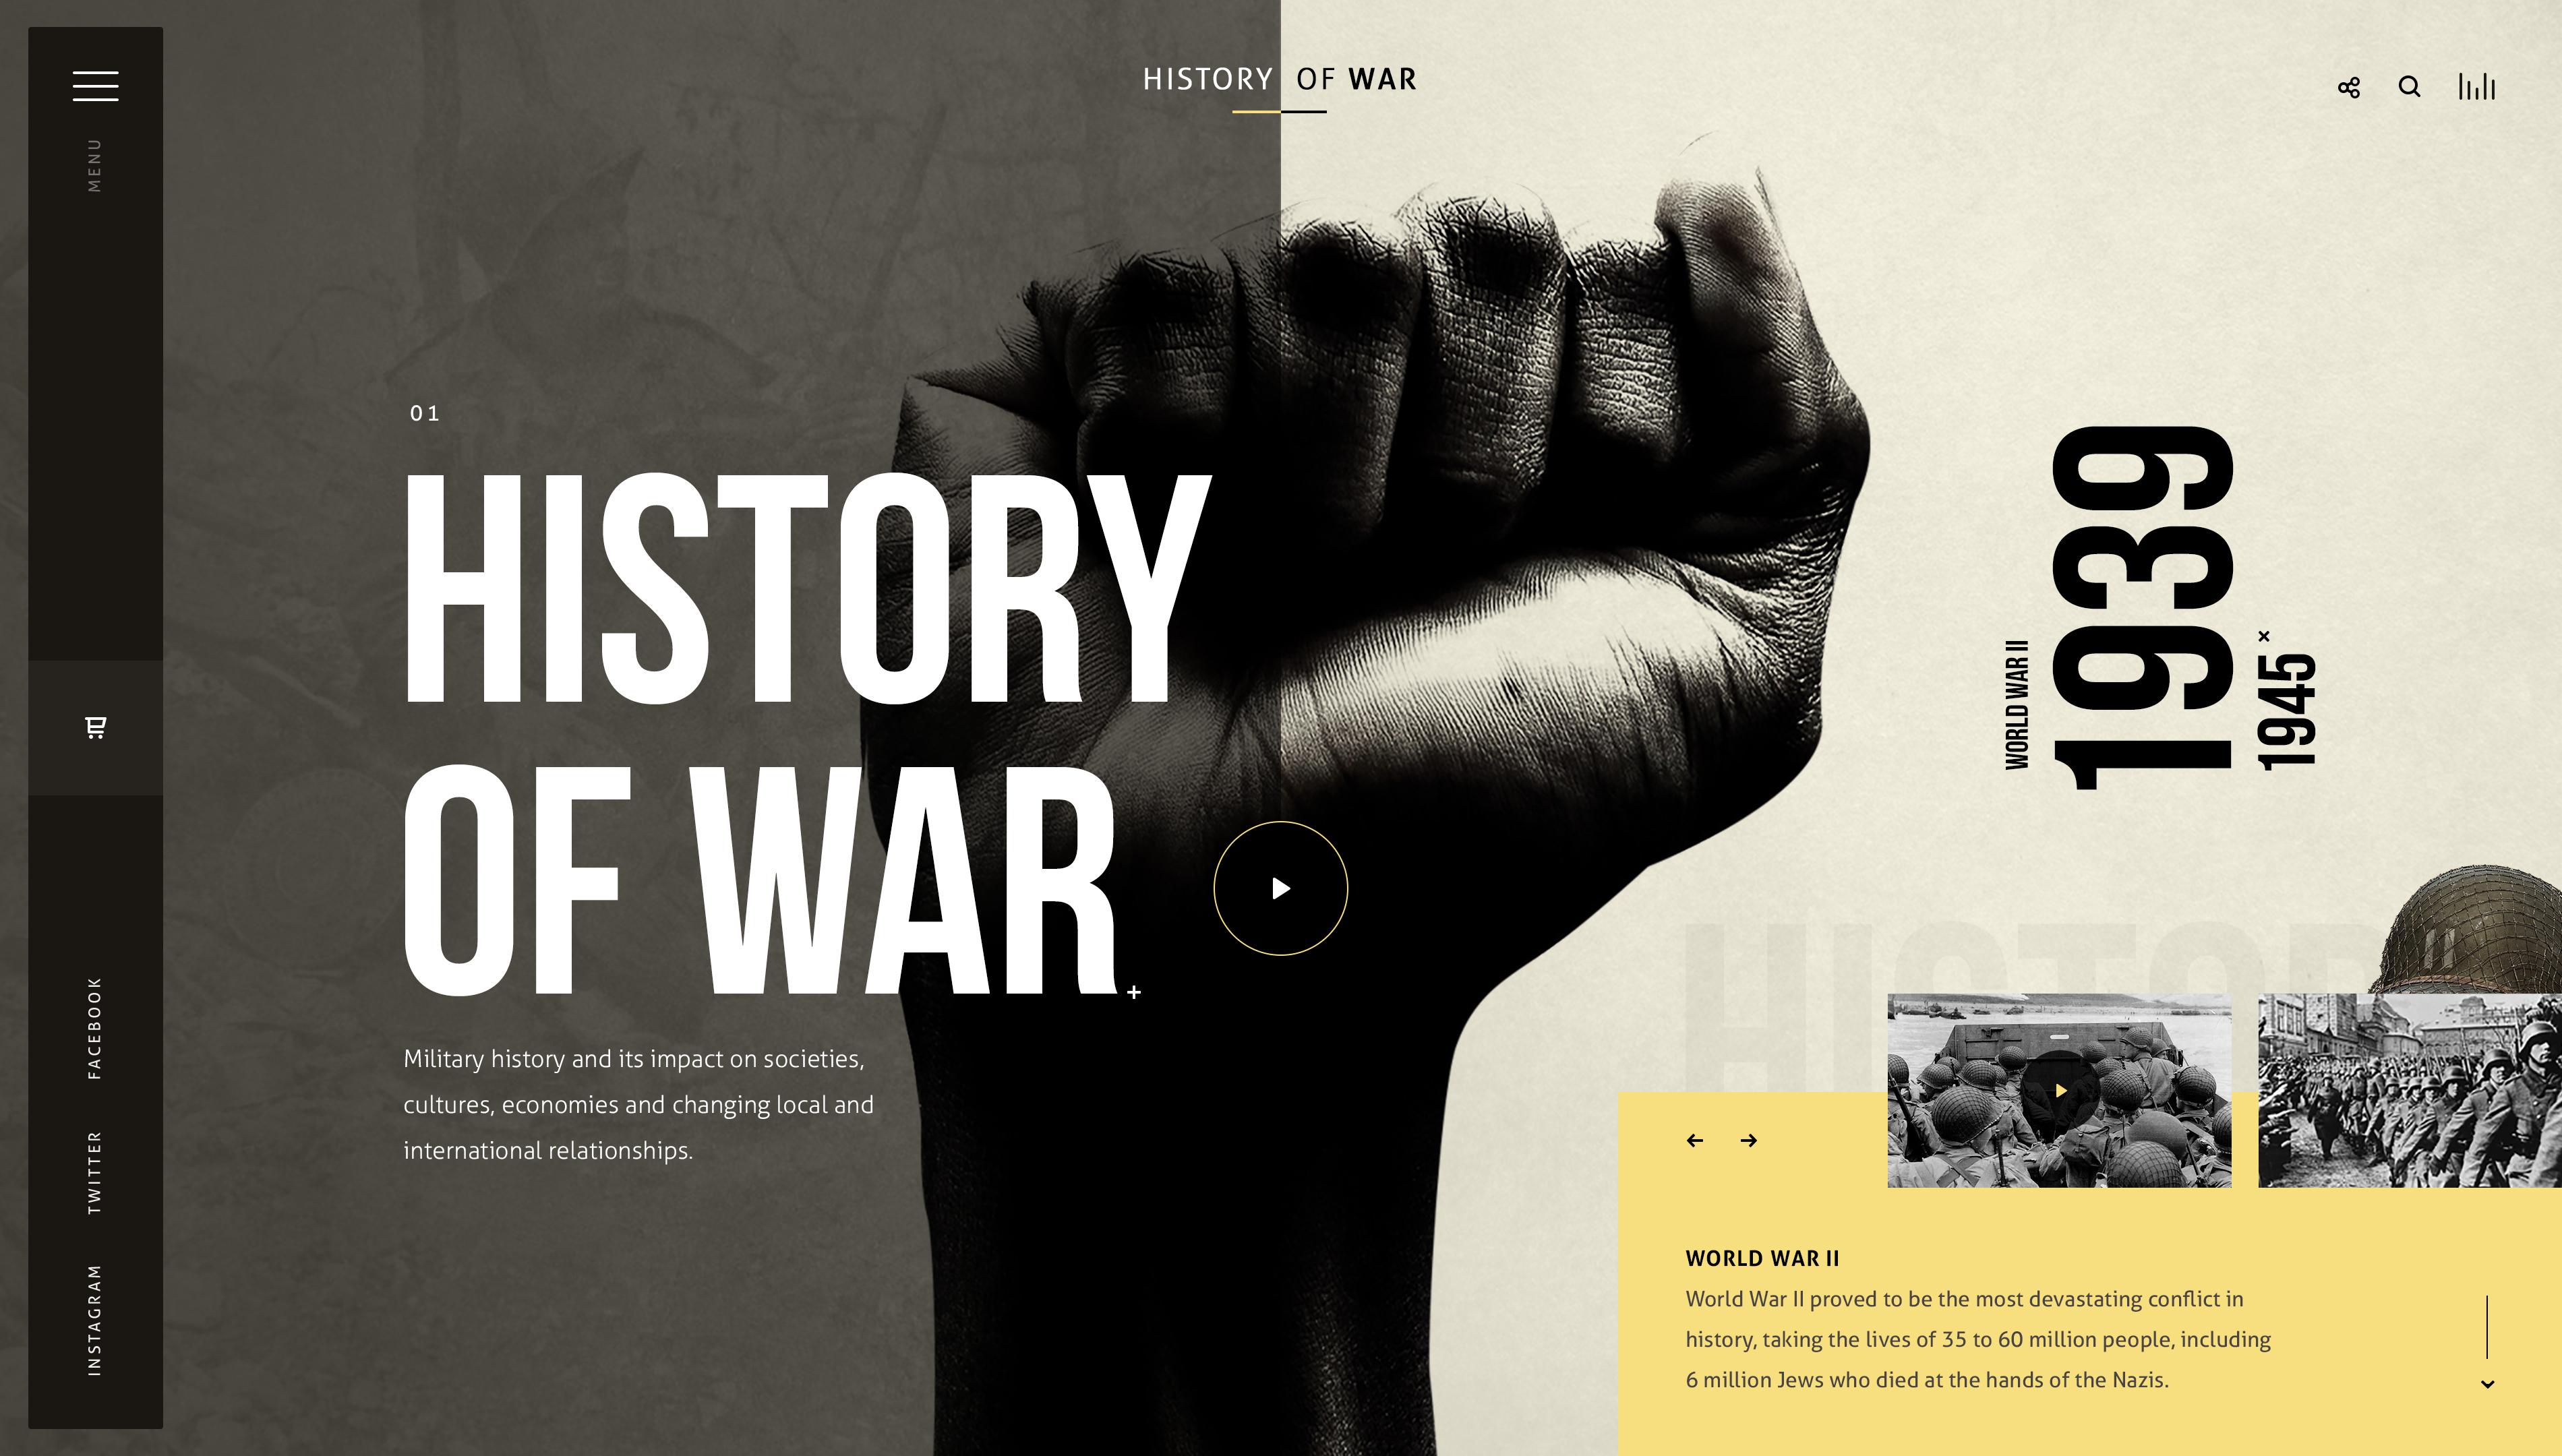 Historyofwar